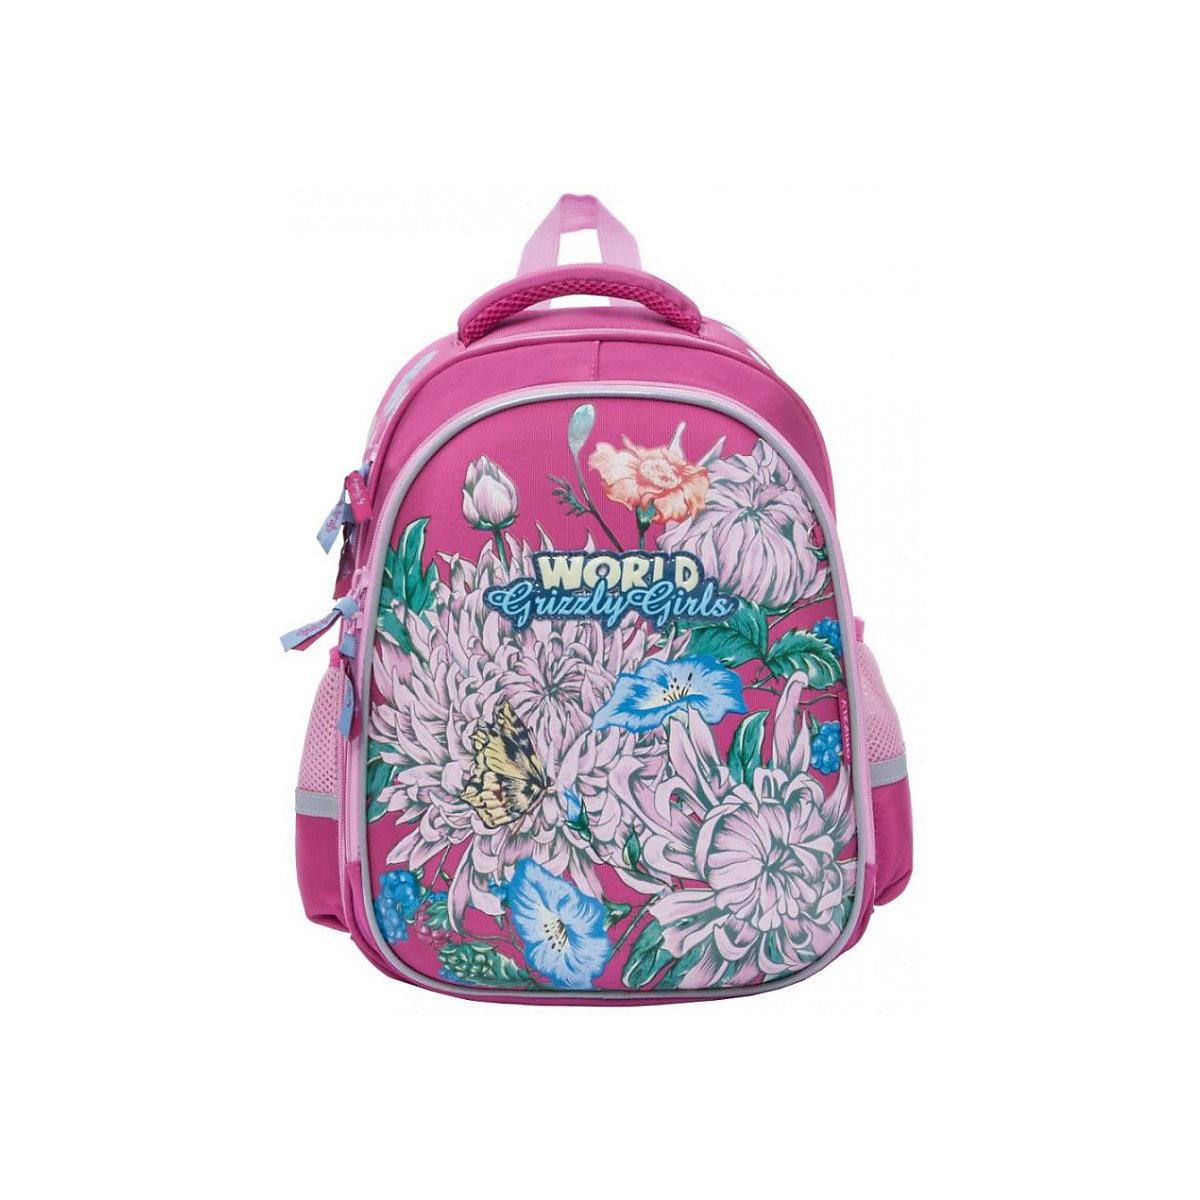 School Bags GRIZZLY 8317274 schoolbag backpack orthopedic bag for boy and girl animals flowers imido brand designer backpack women genuine leather bag for girl schoolbag black sheepskin fashion rivet mochila feminina sld051